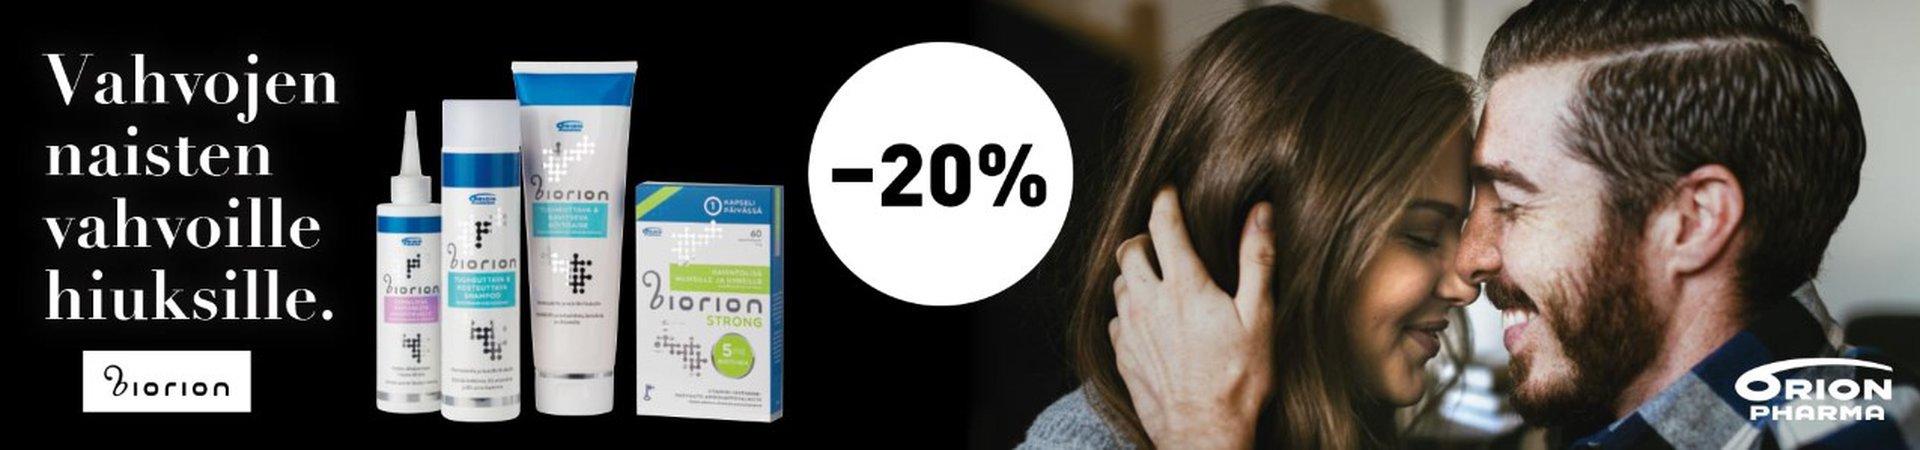 Biorion -20 % helmikuu 20